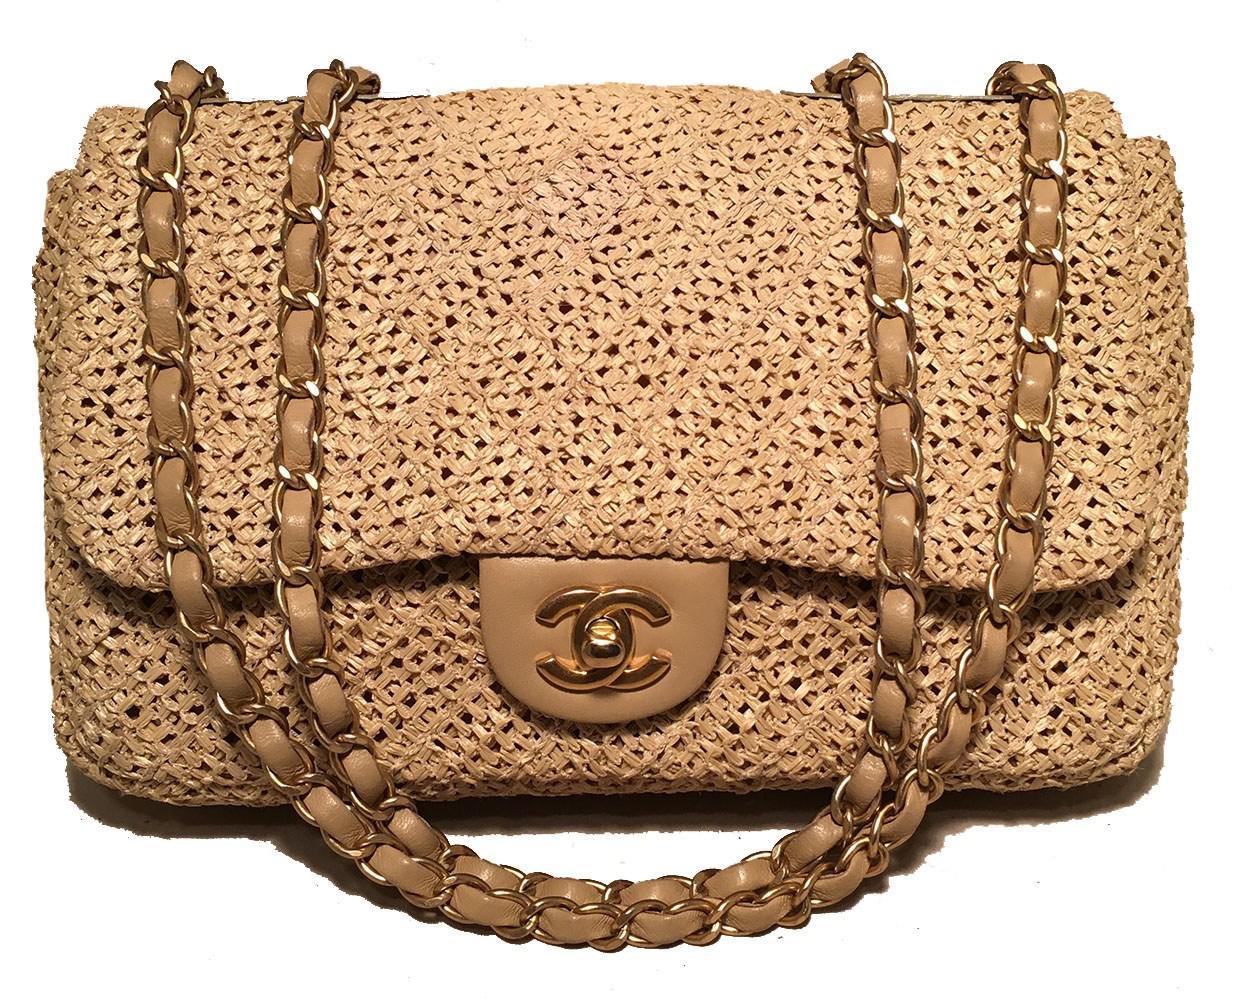 0c1ebe8c36fe61 Chanel Tan Raffia Classic Flap Shoulder Bag in Brown - Lyst